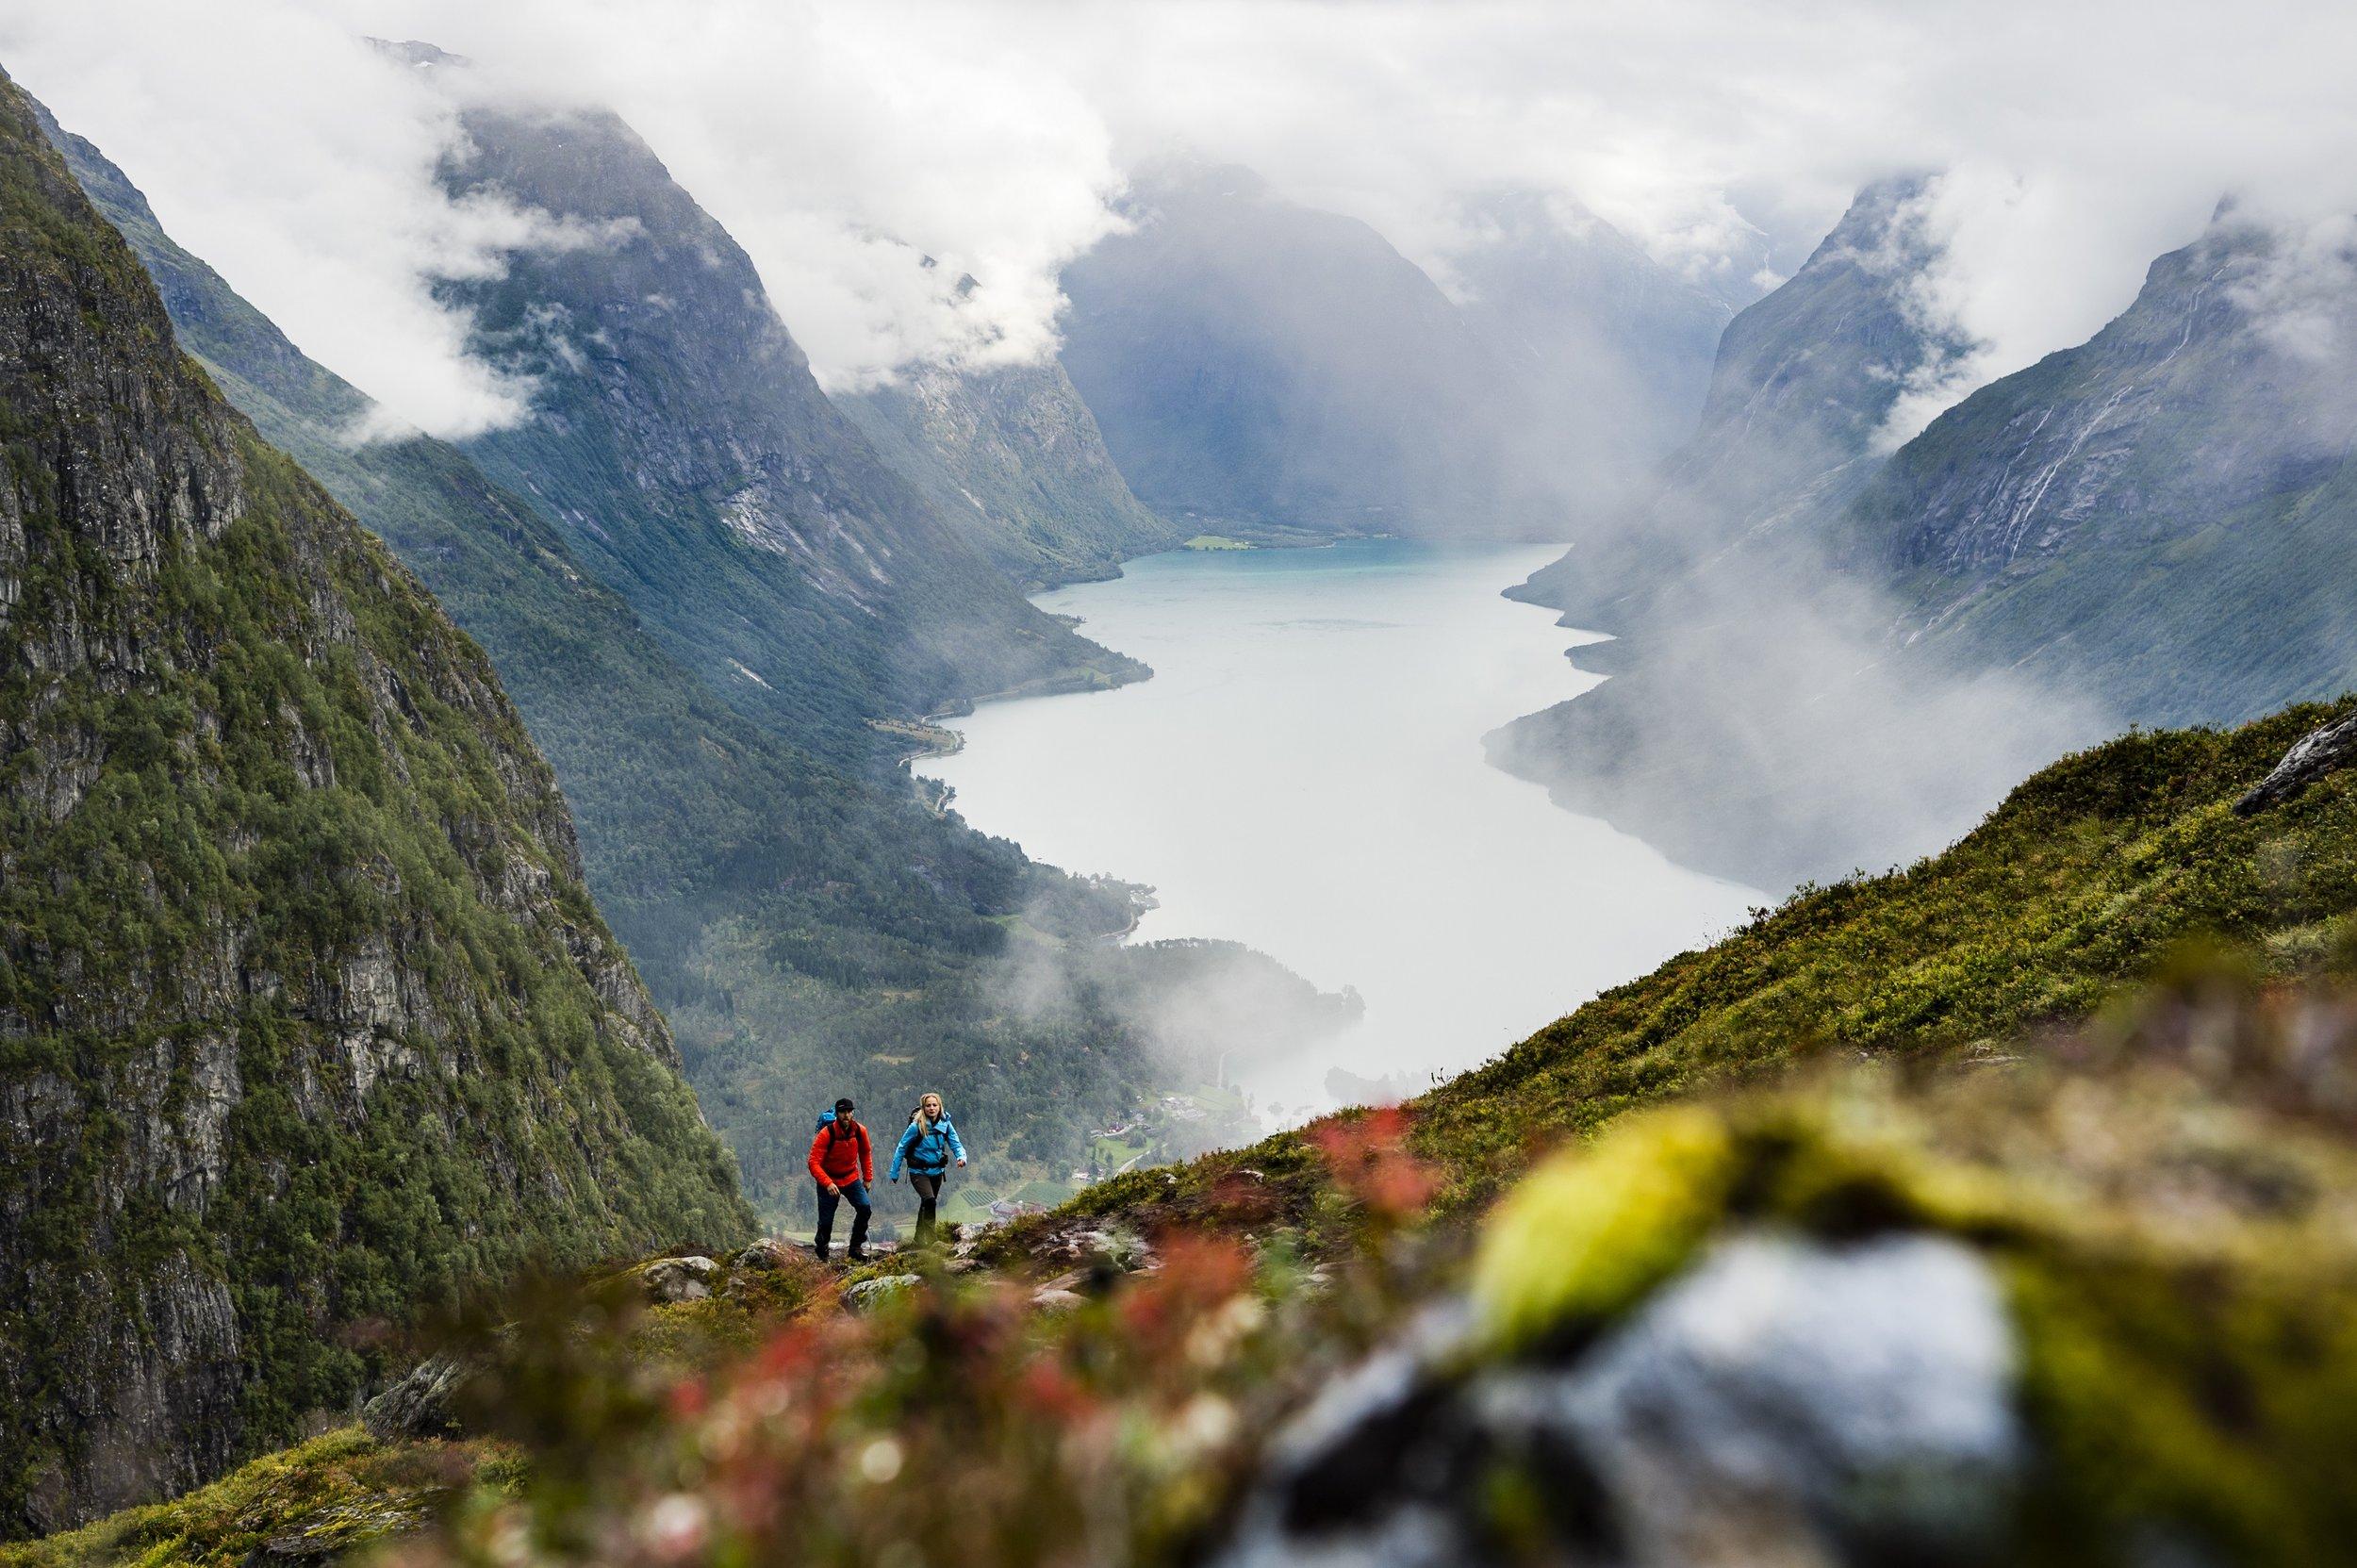 Vandring på Hoven. Foto: Mattias Fredriksson/Fjord Norge